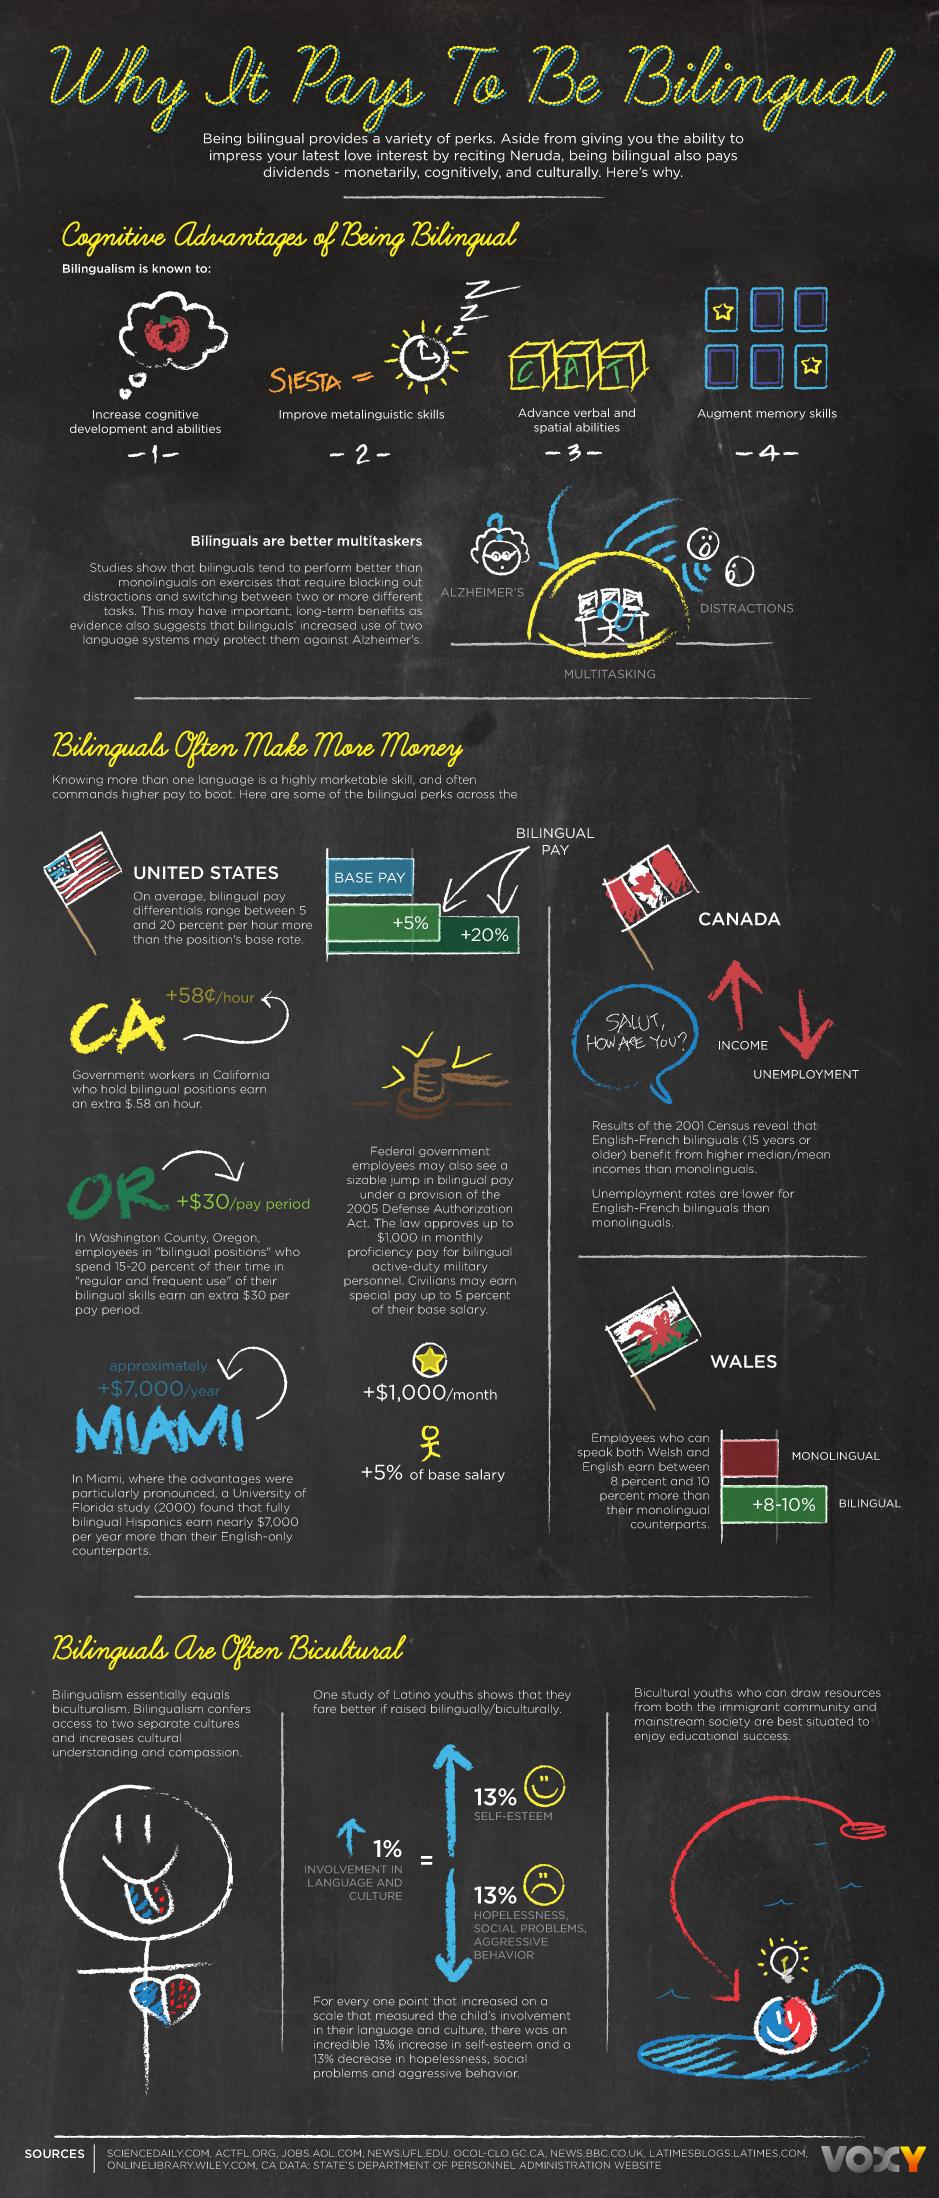 voxy-bilingual-infographic[1]